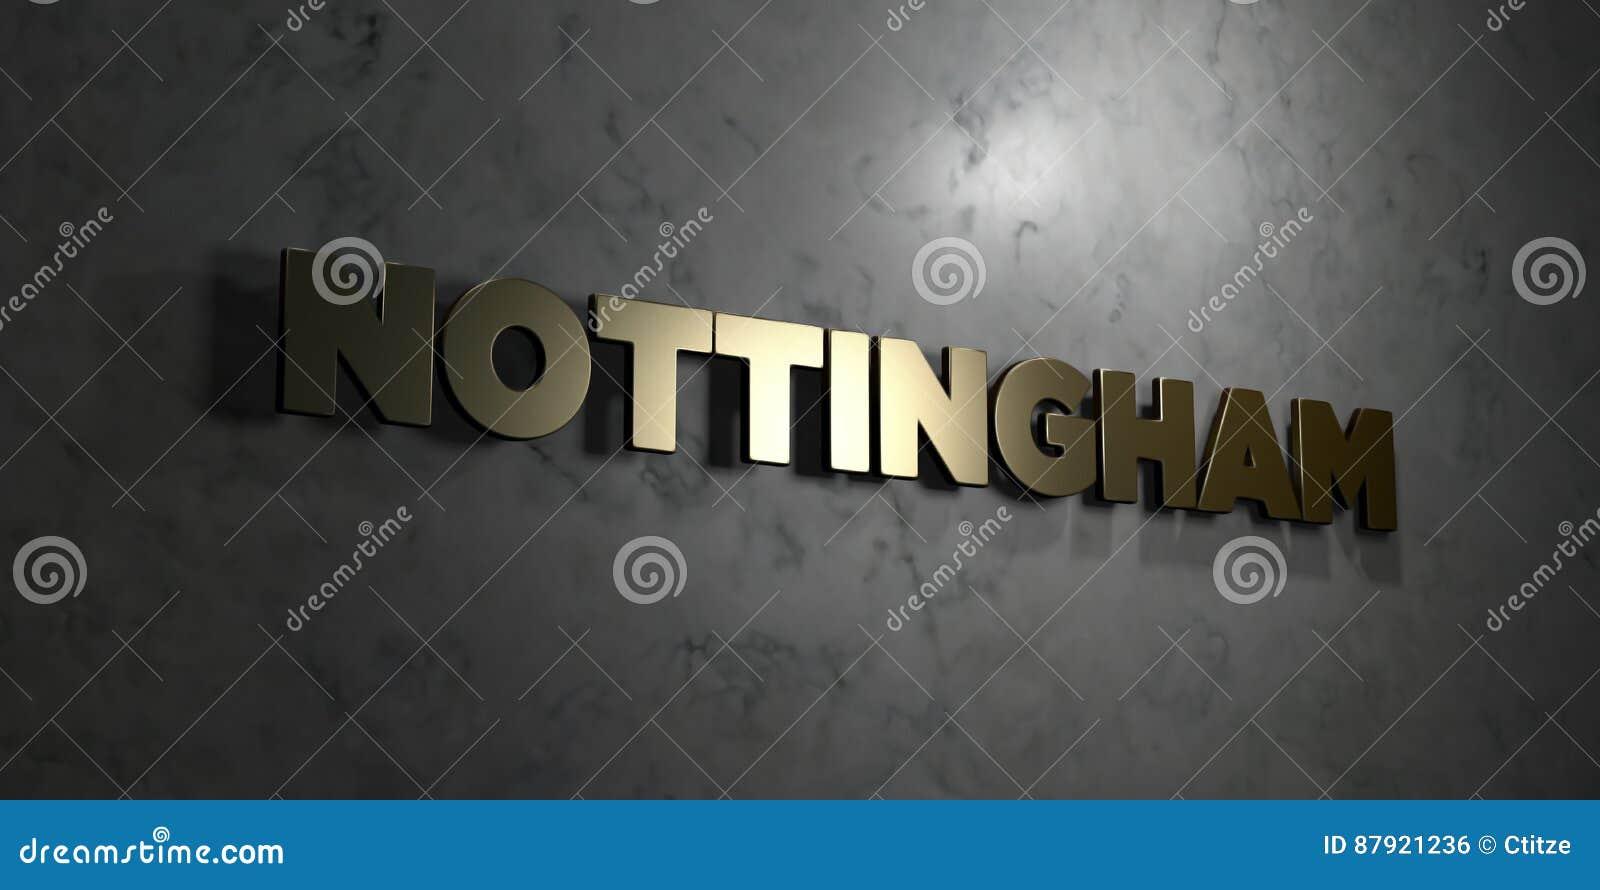 Free ads nottingham